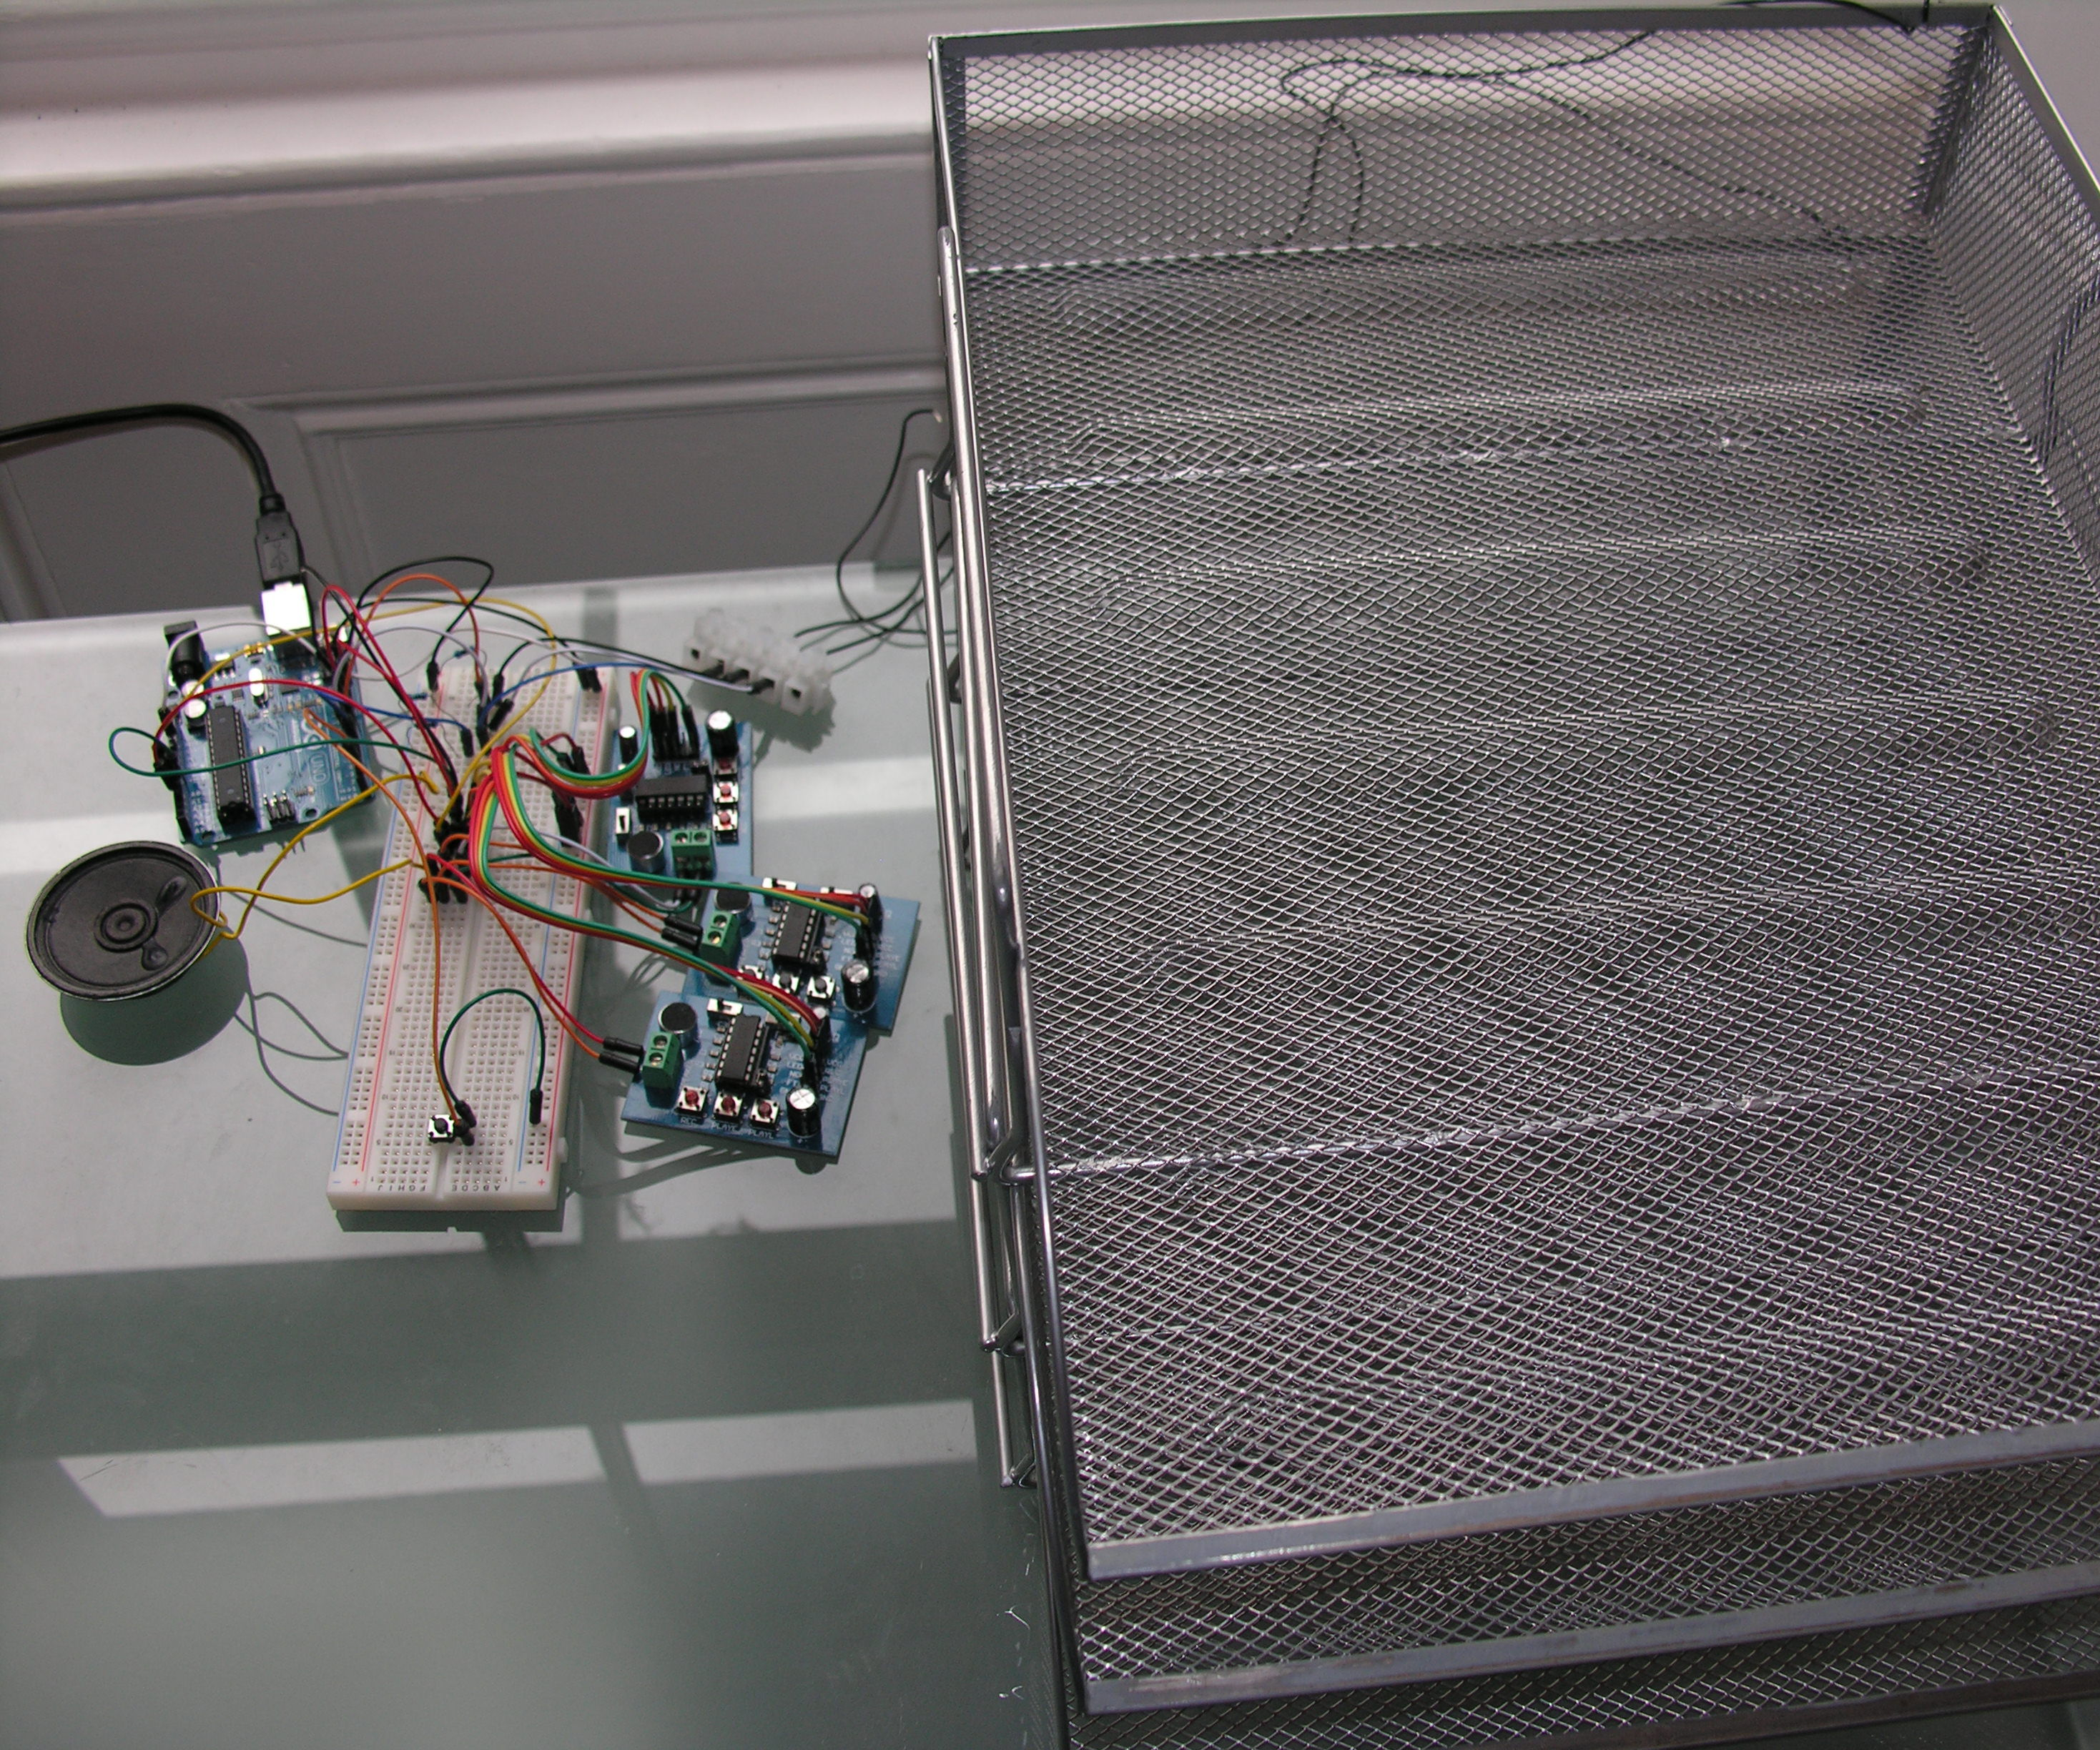 Touch Sensitive Audio Desk Trays- Arduino